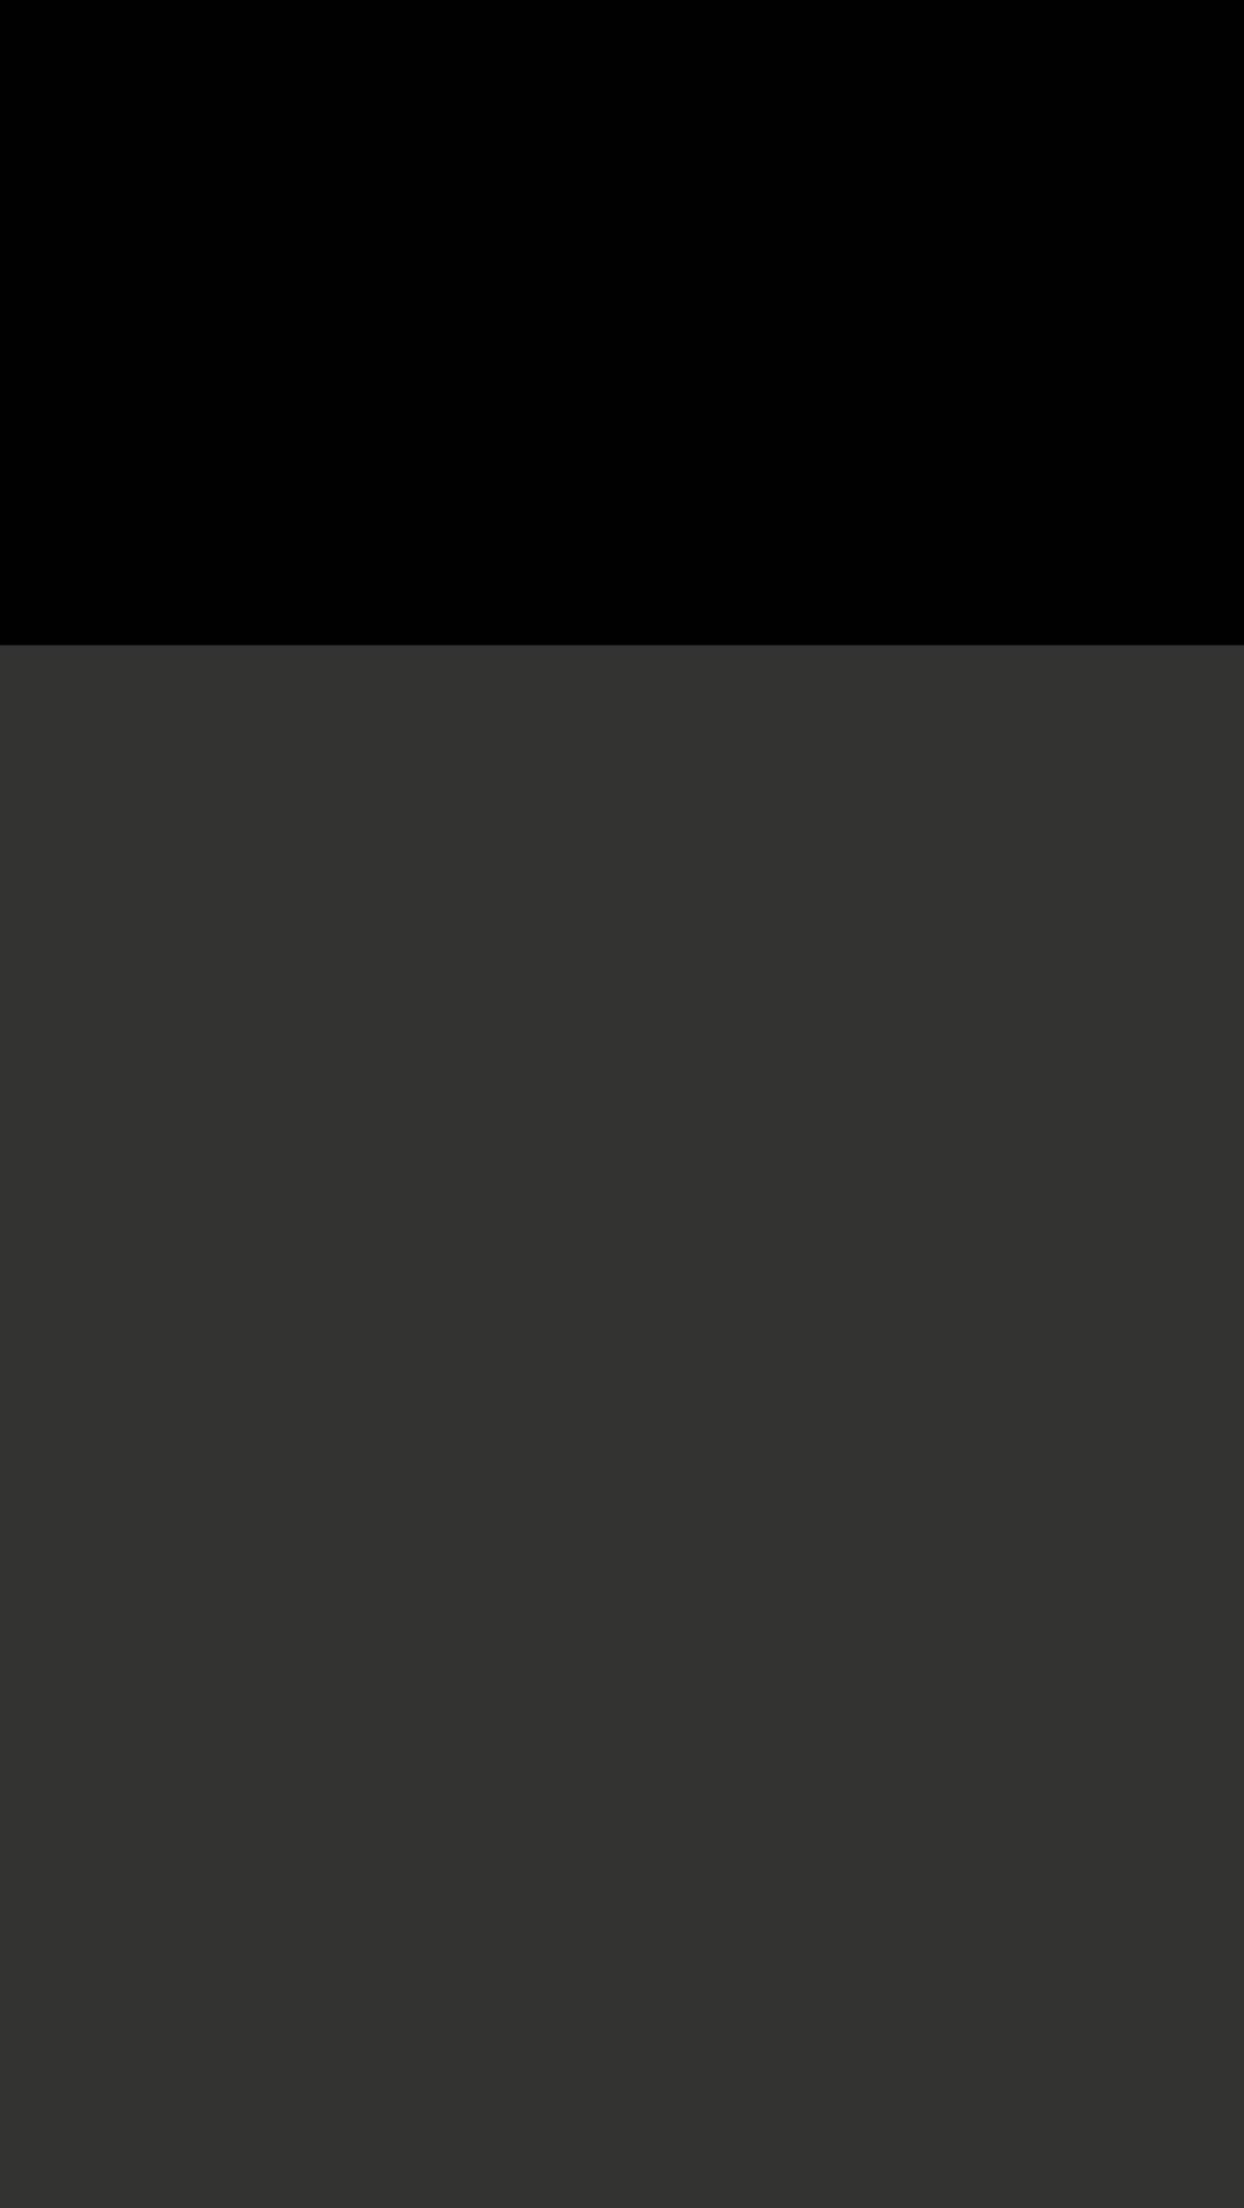 Black/gray minimal iPhone 6 Plus wallpaper. | Black and ...